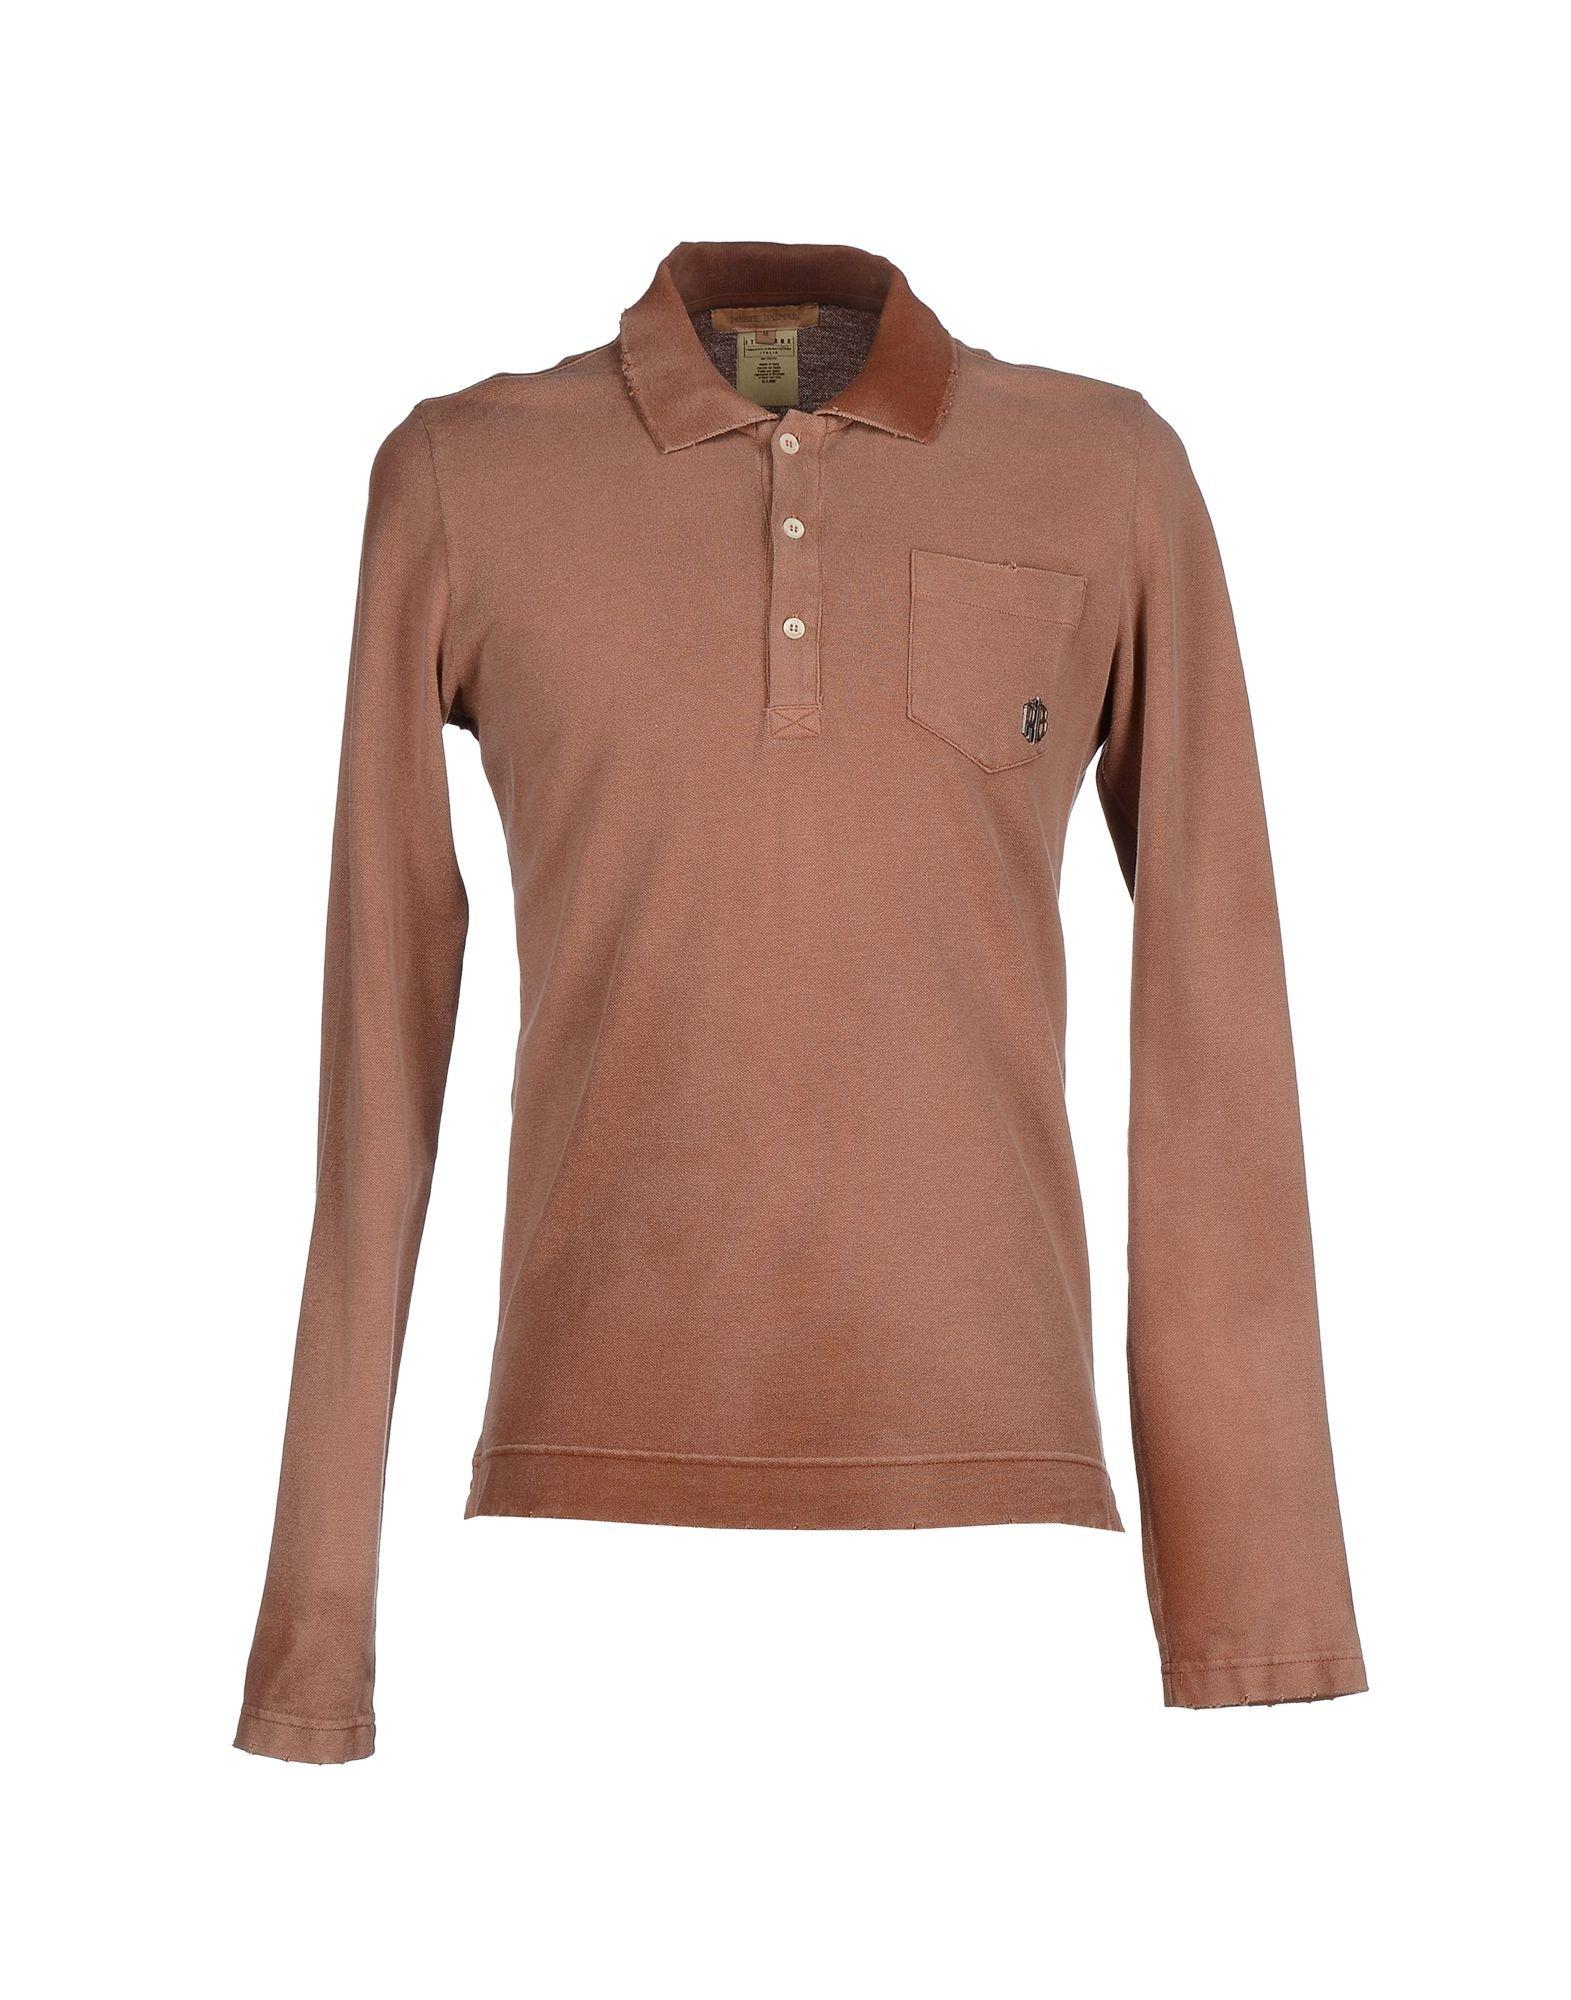 Balmain Polo Shirt In Brown For Men Lyst